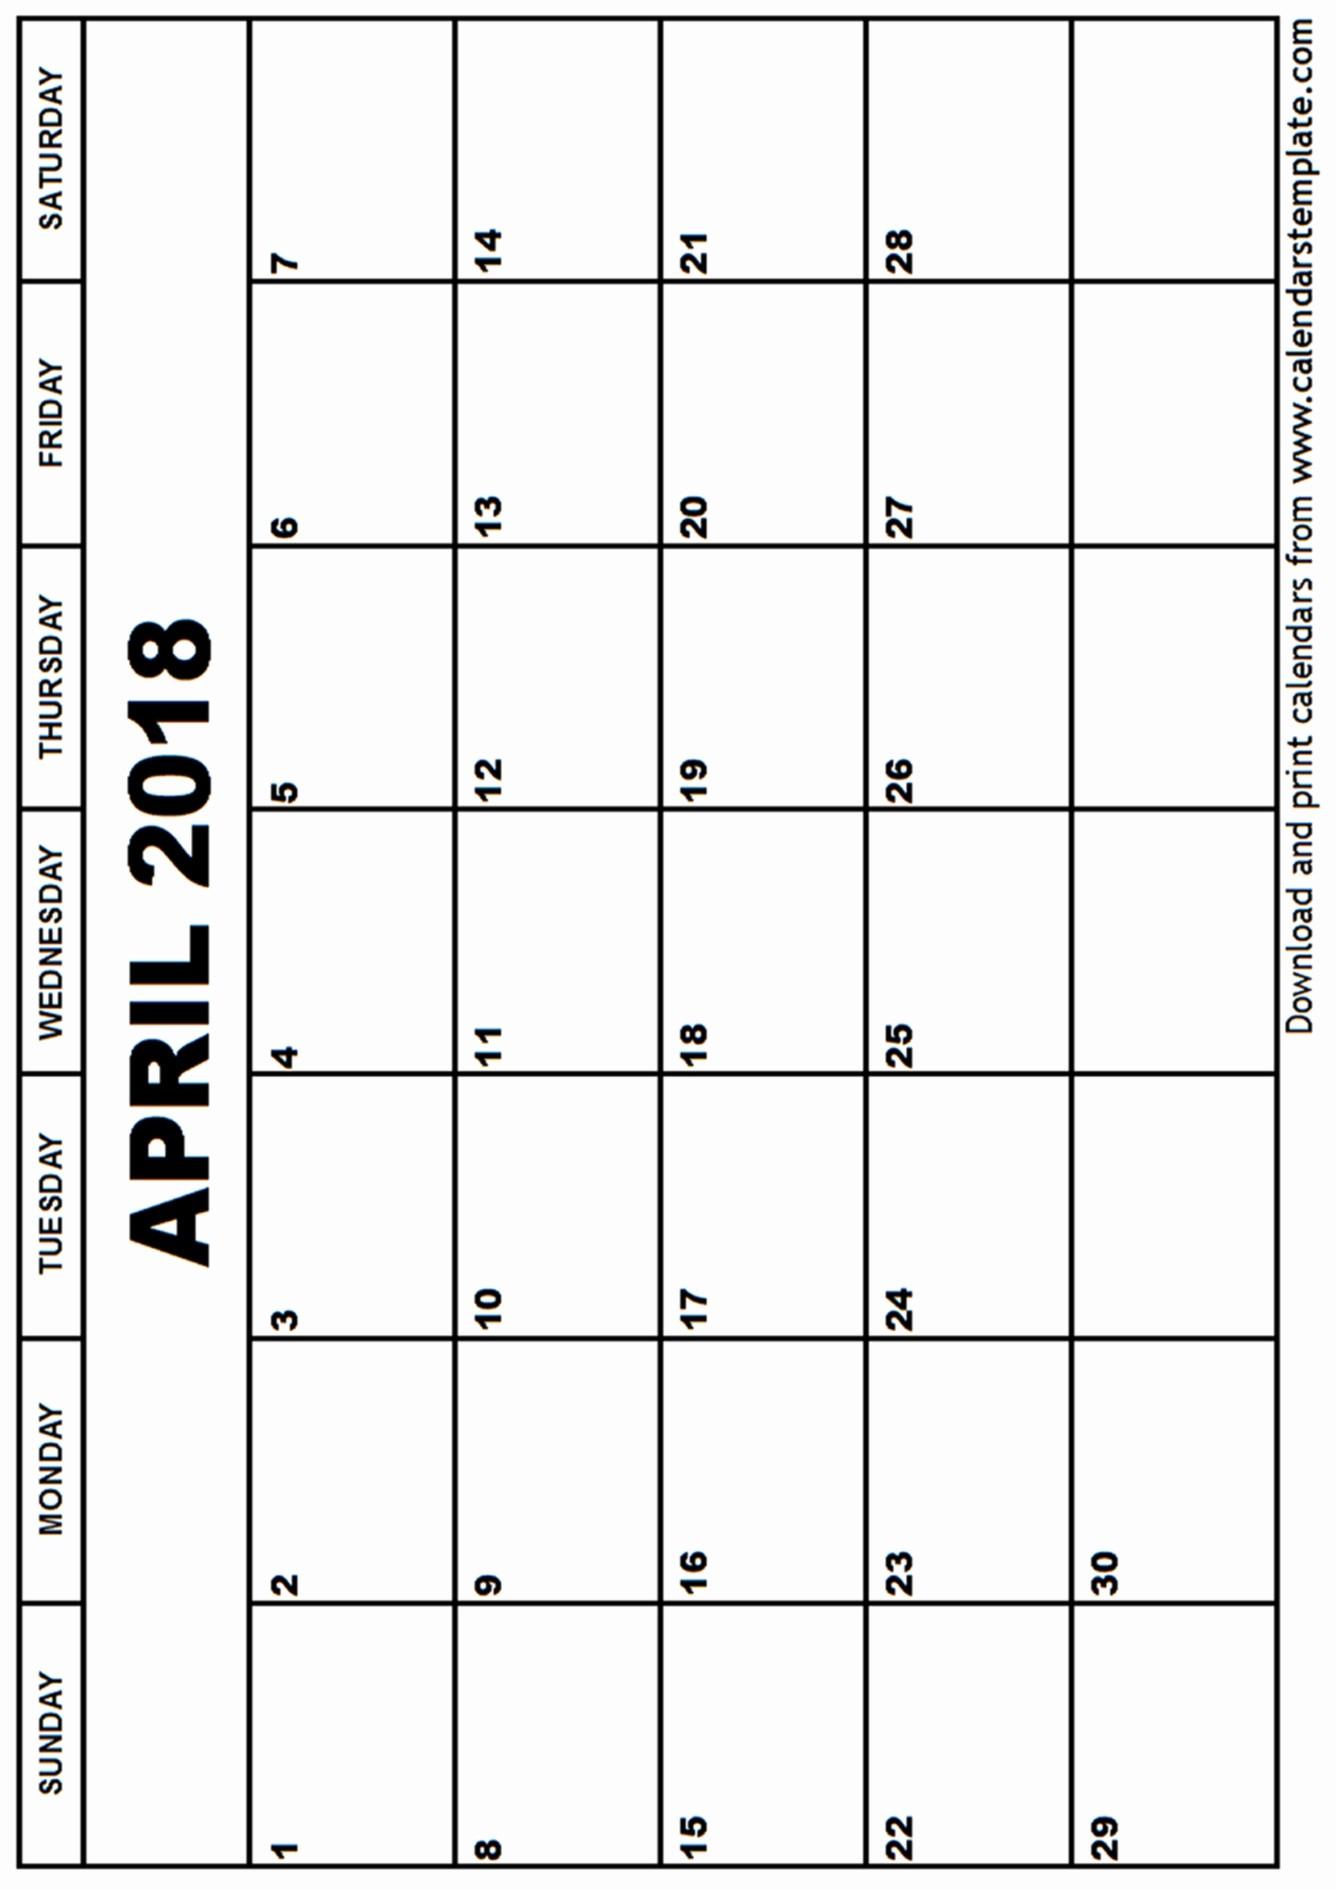 Blank April 2018 Calendar Template Unique April 2018 Calendar Template